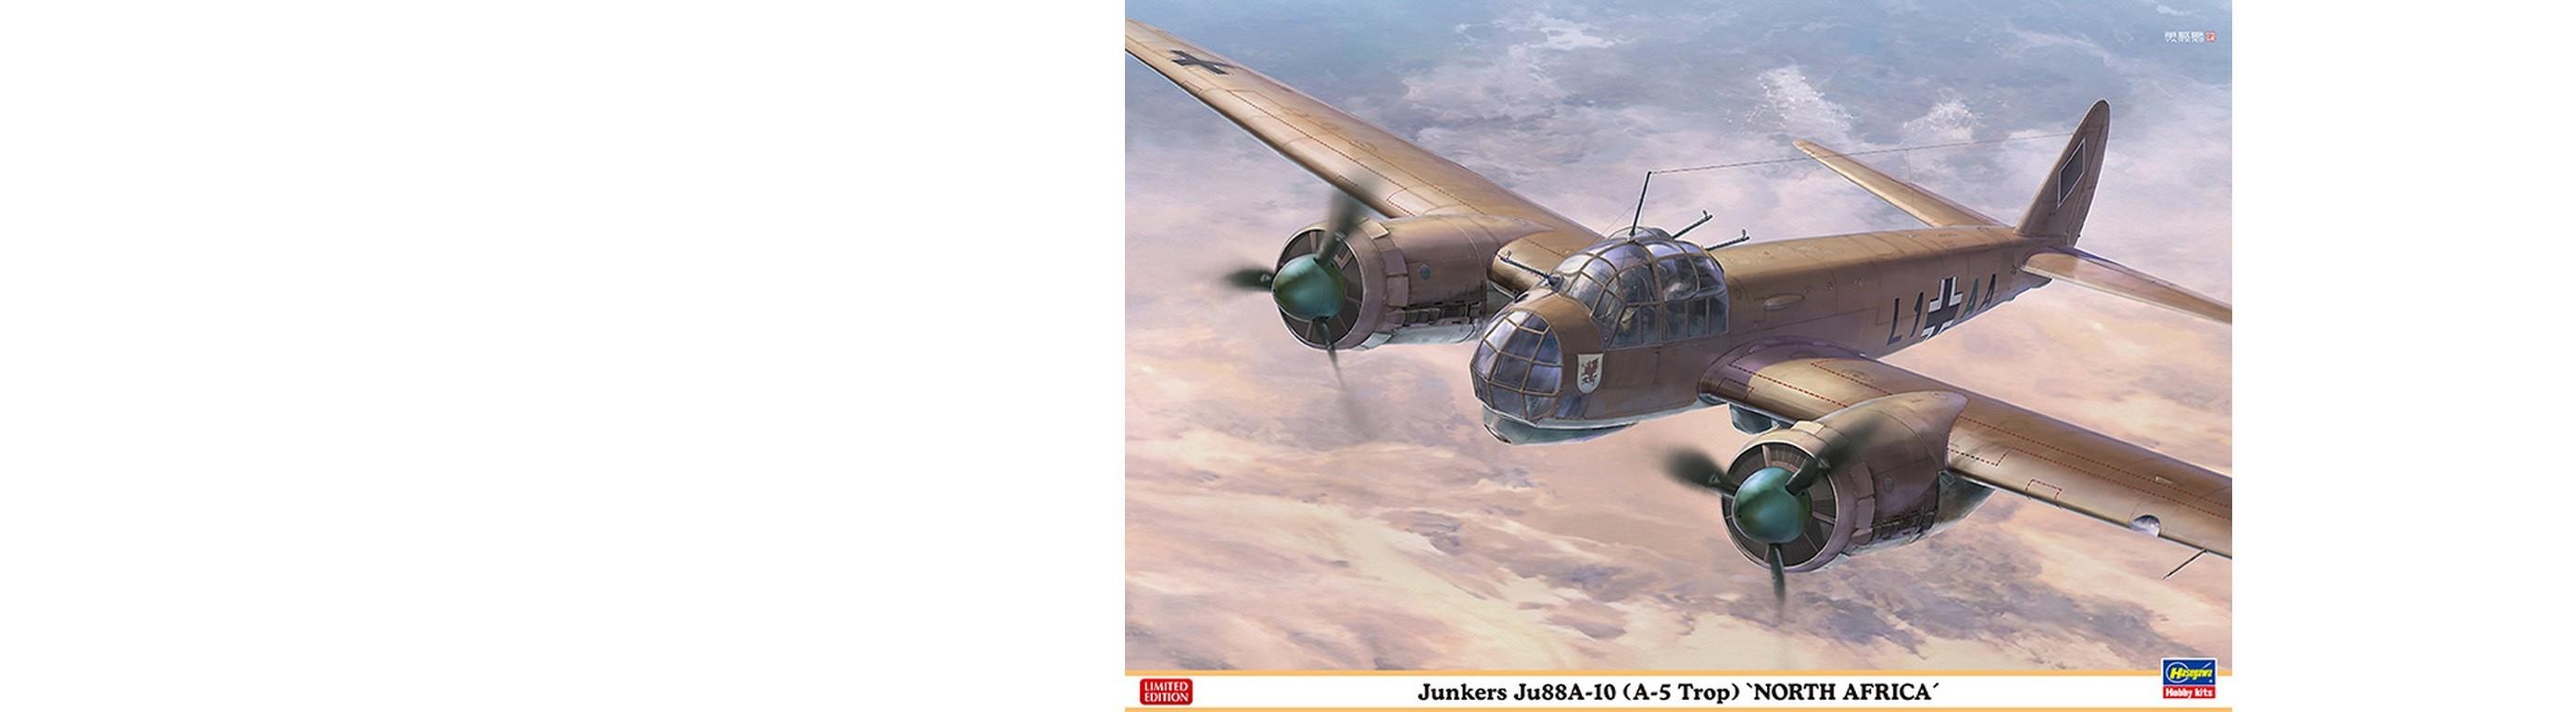 JUNKERS JU 88A-10 NORDAFRIKA